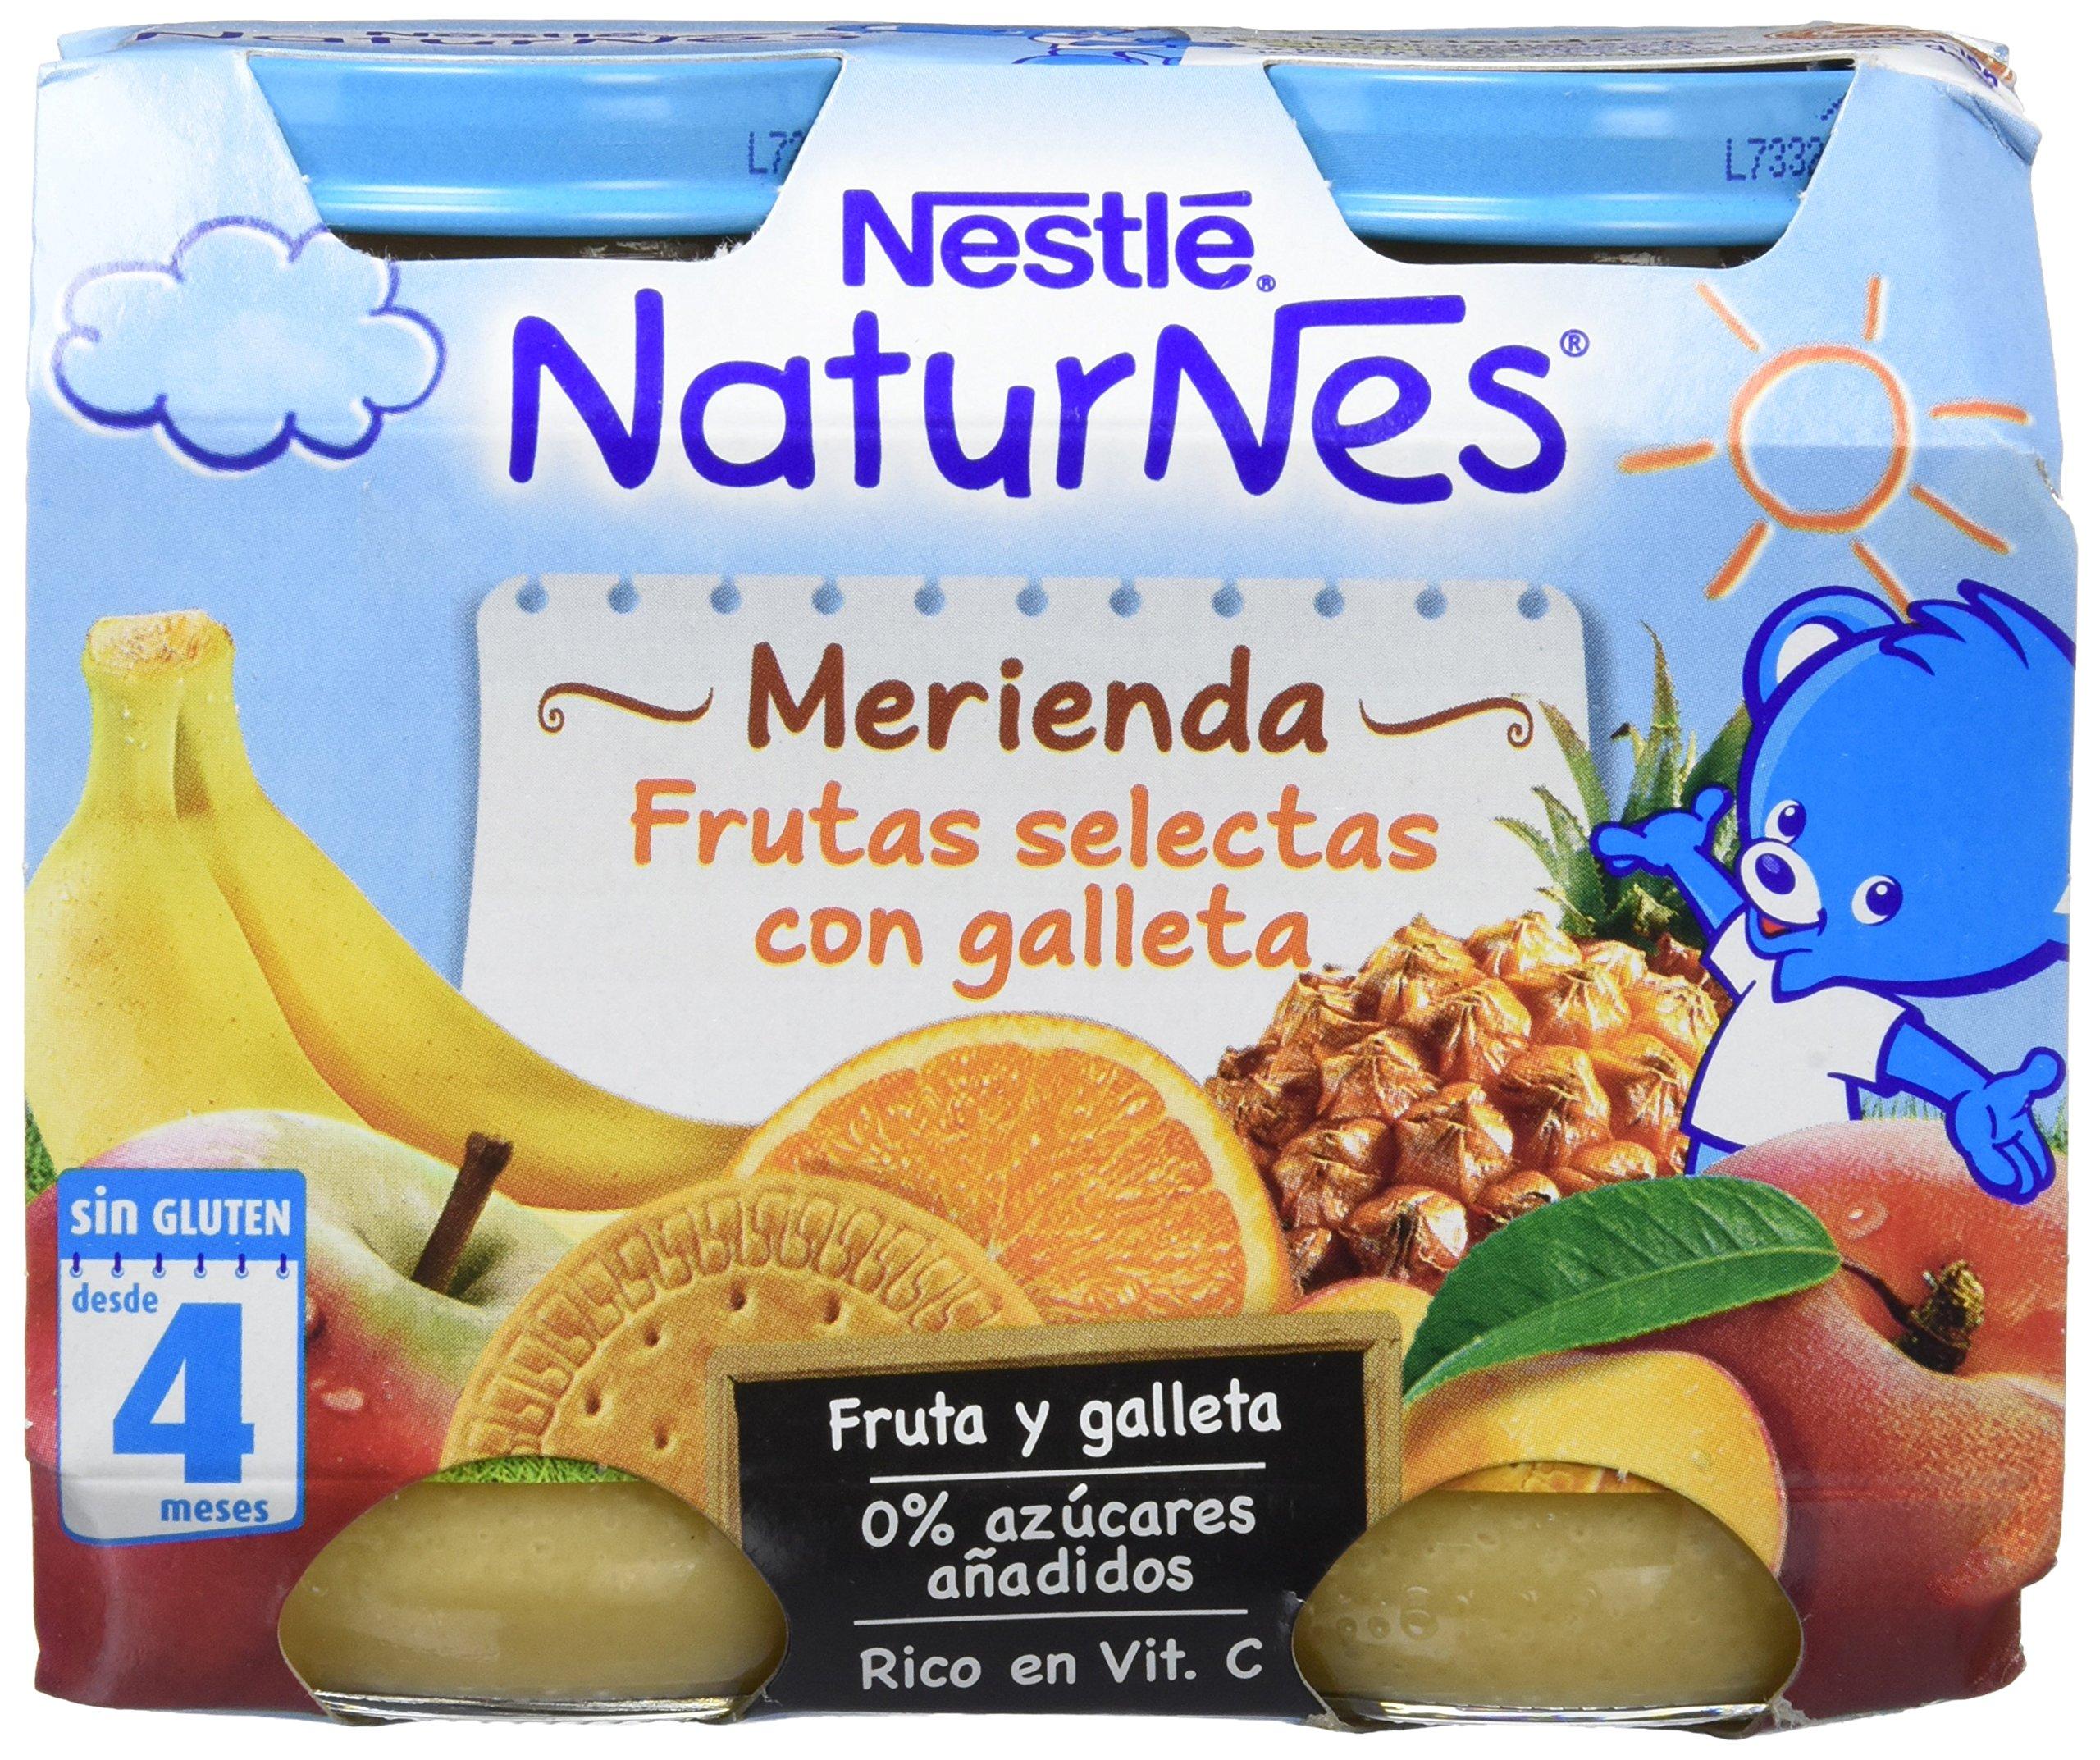 Nestlé Naturnes Merienda Frutas Selectas con Galleta - Paquete de 6 x 2 unidades de 200 g - Total: 2